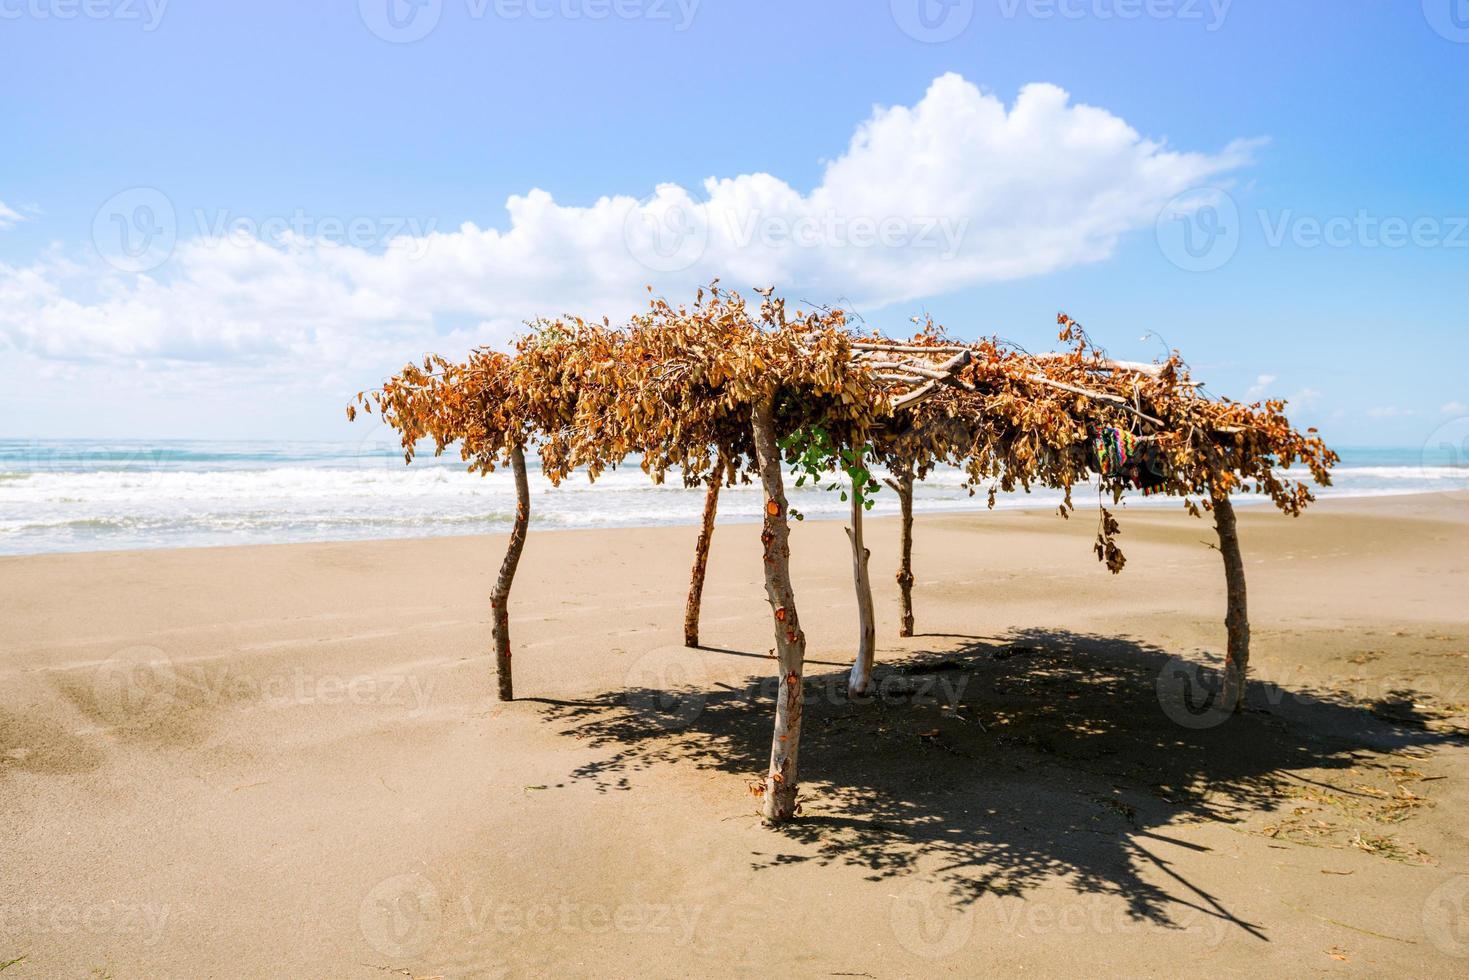 playa desierta y toldo foto